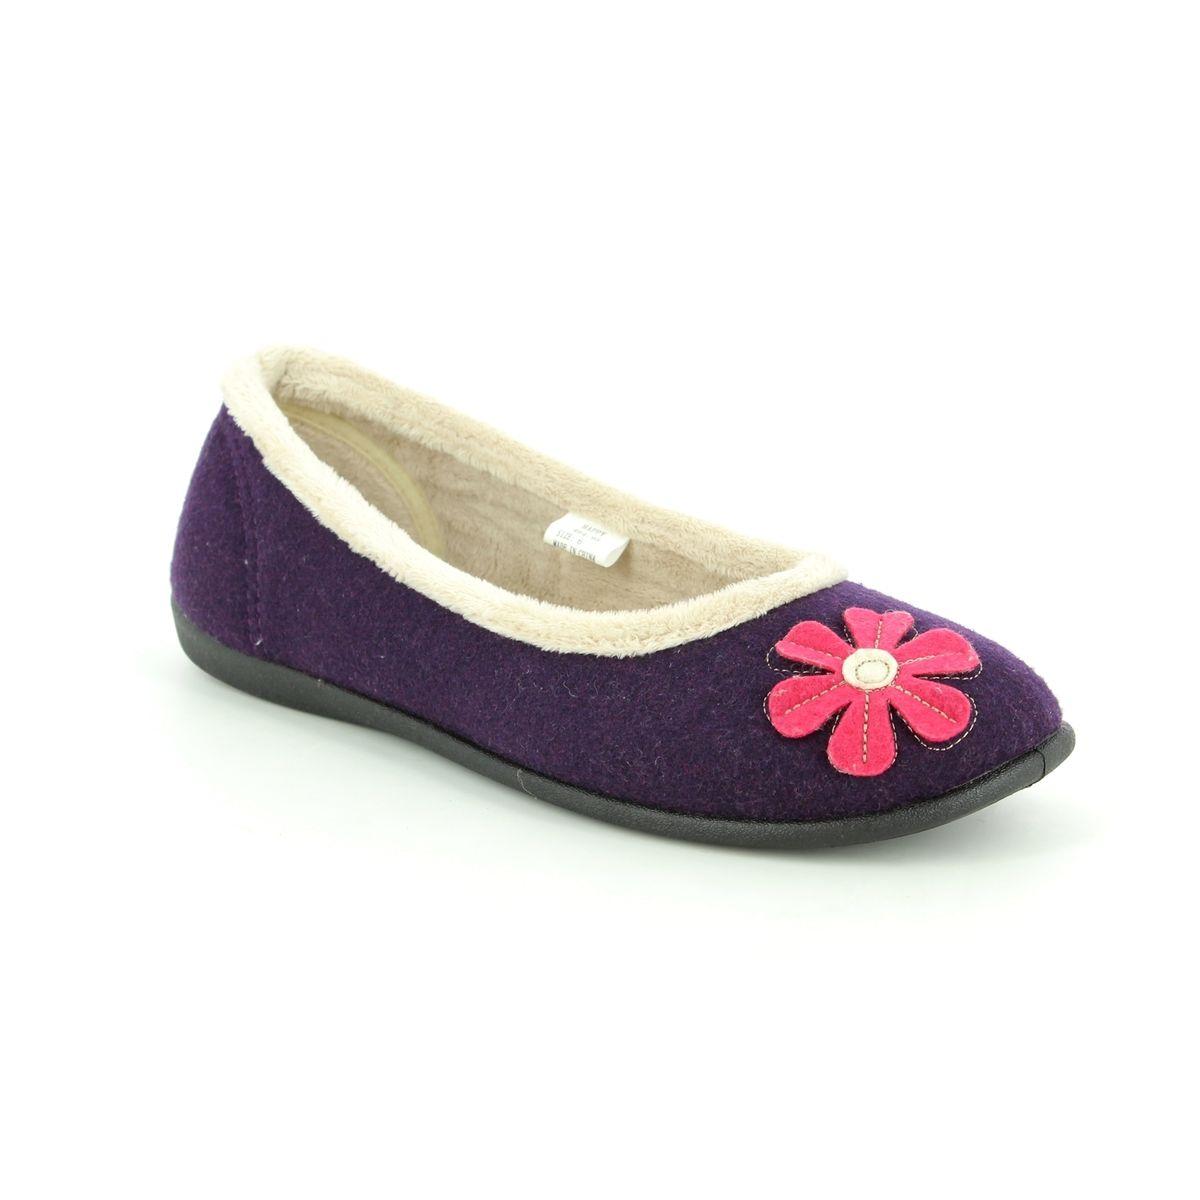 Padders HAPPY Ladies Womens Felt Wide Ballerina Pump Slippers Purple E Fit